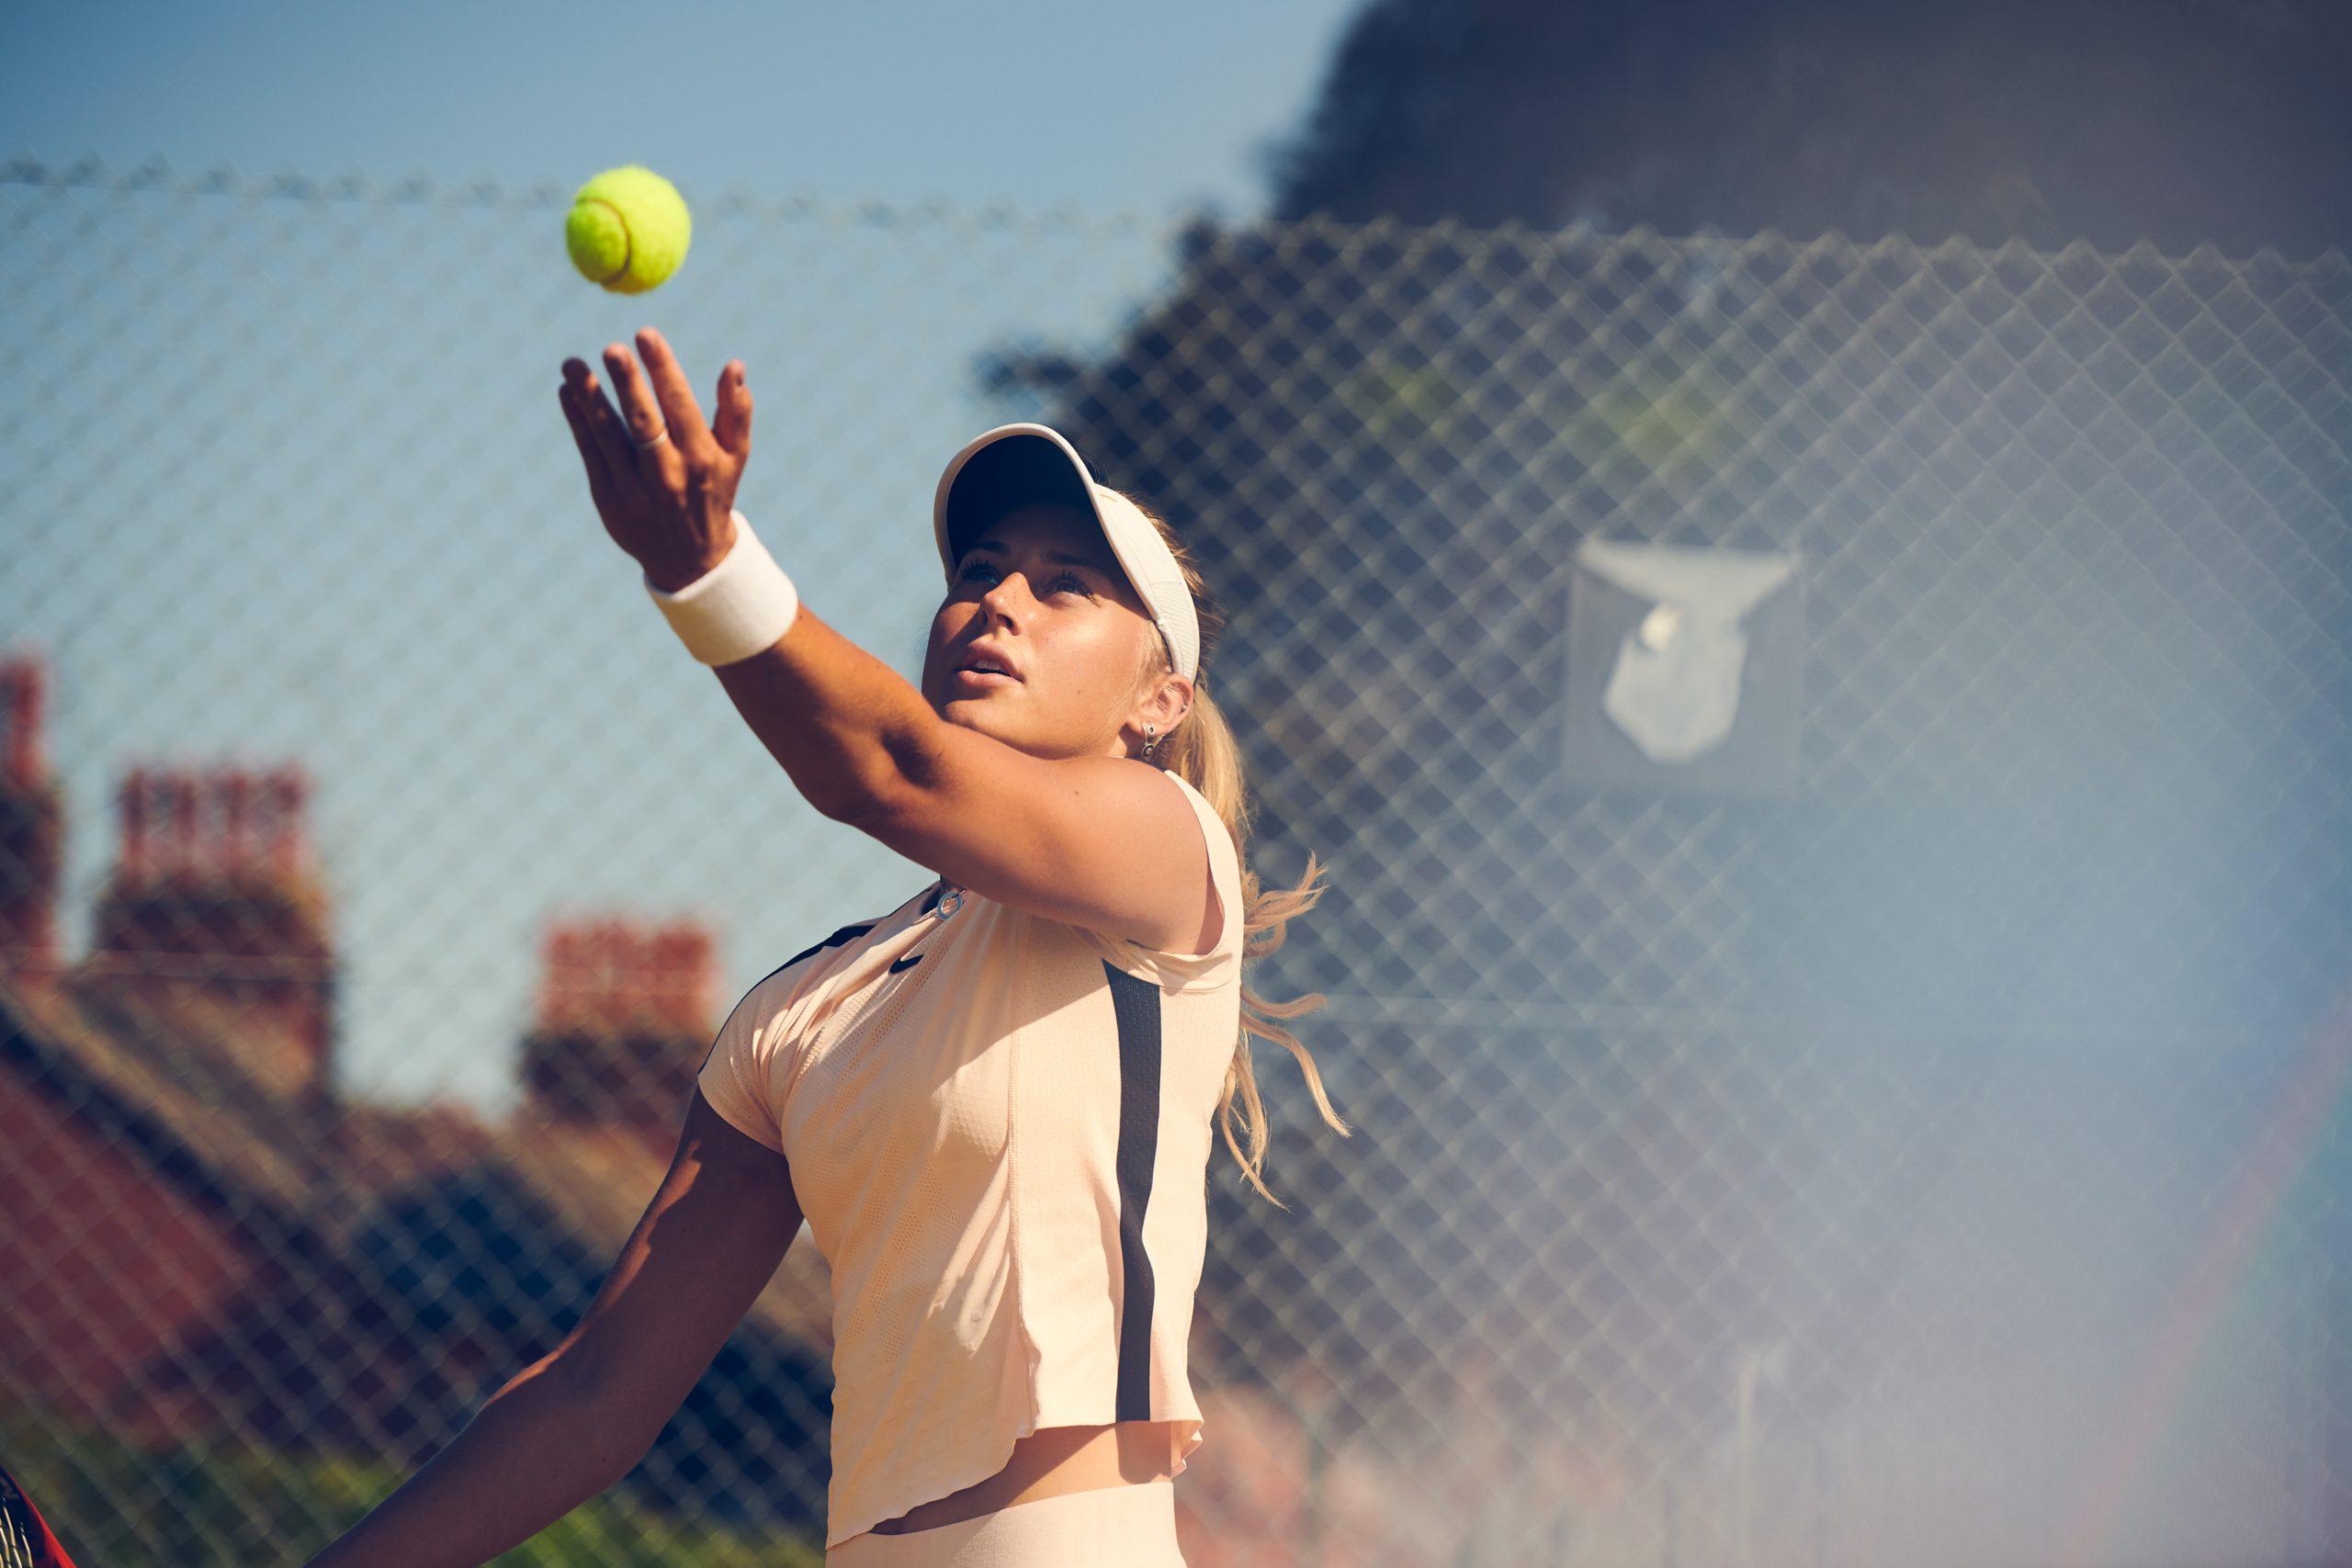 Forte_Olivia_Tennis_0248